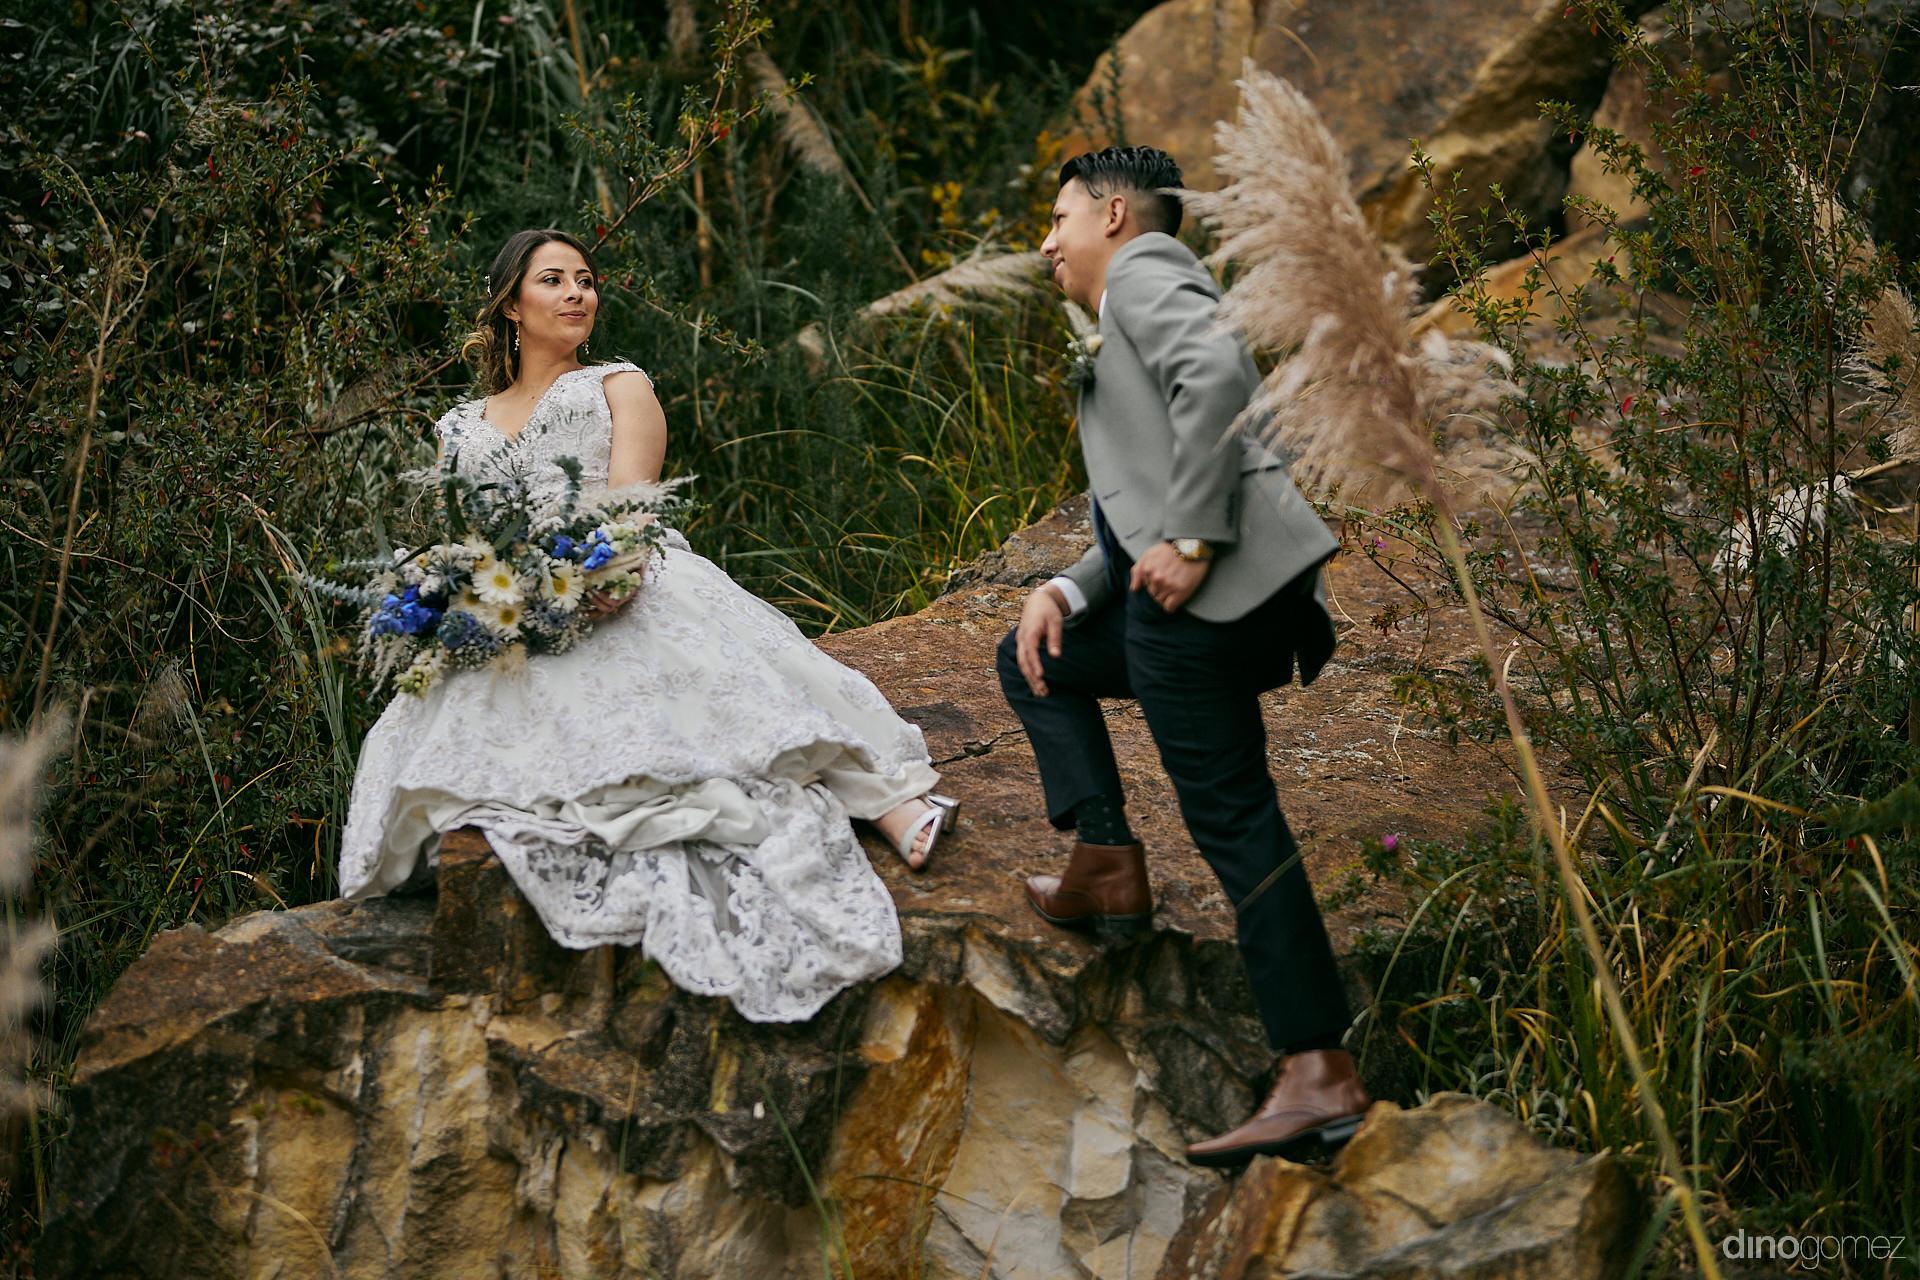 020 - Diy Budget Destination Weddings Can Be Prety Too!